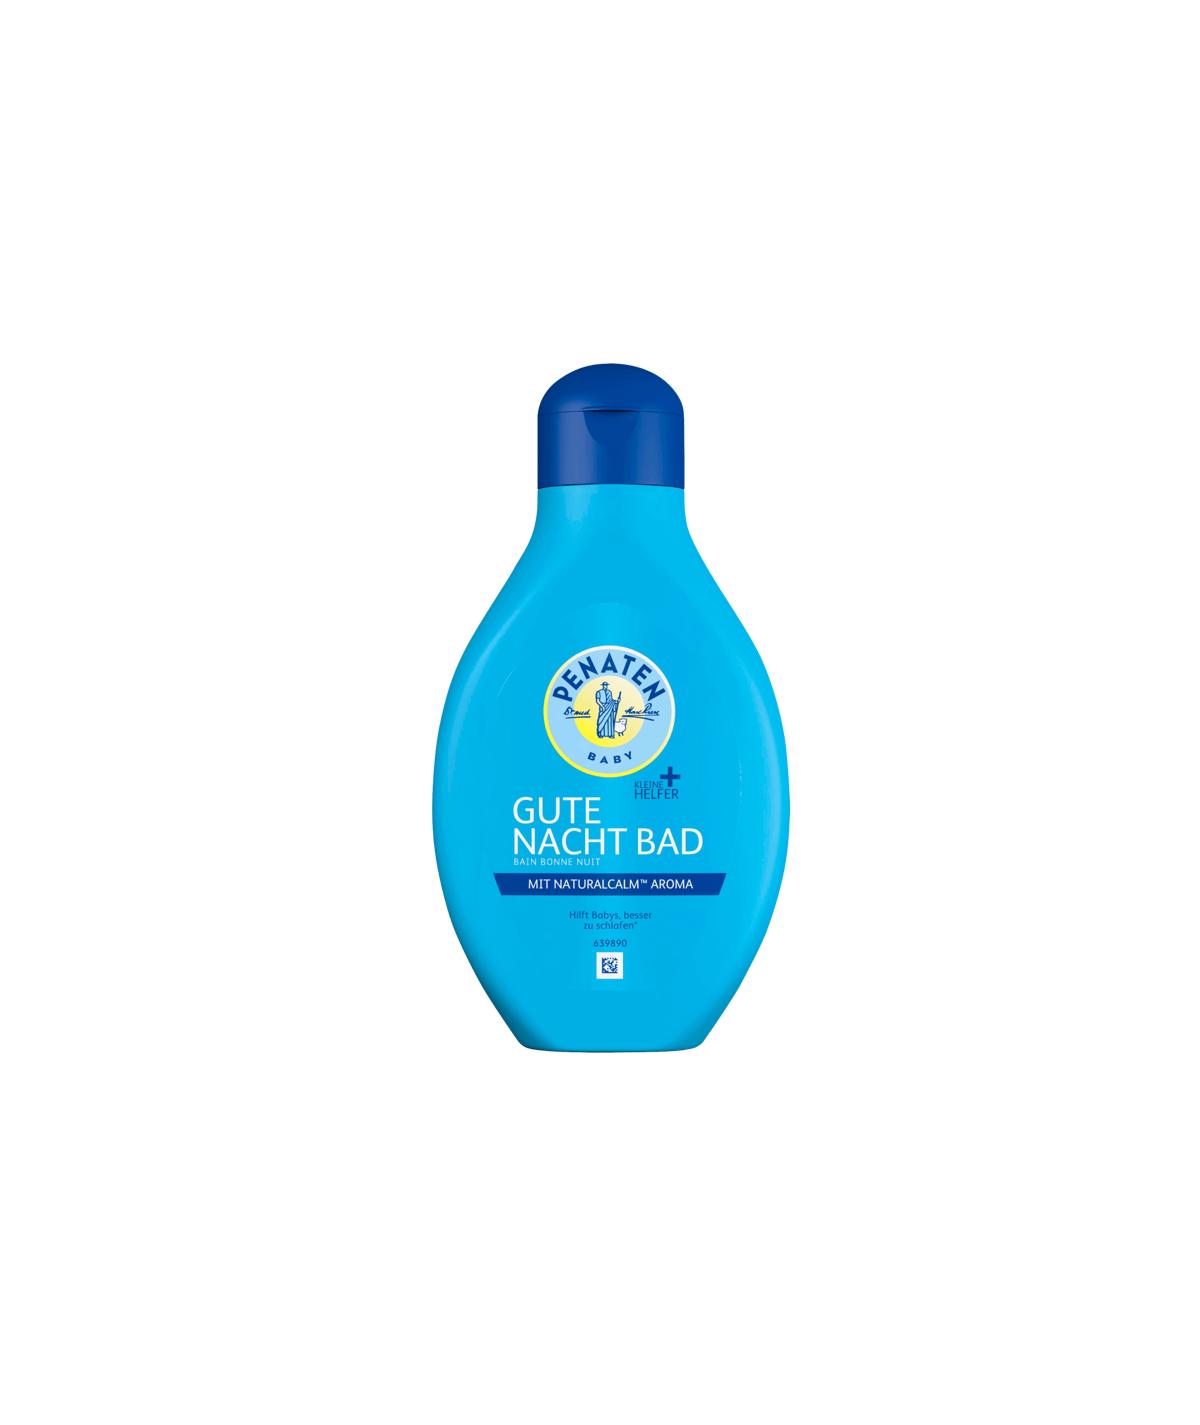 Additif pour le bain Good Night Bath, 400 ml